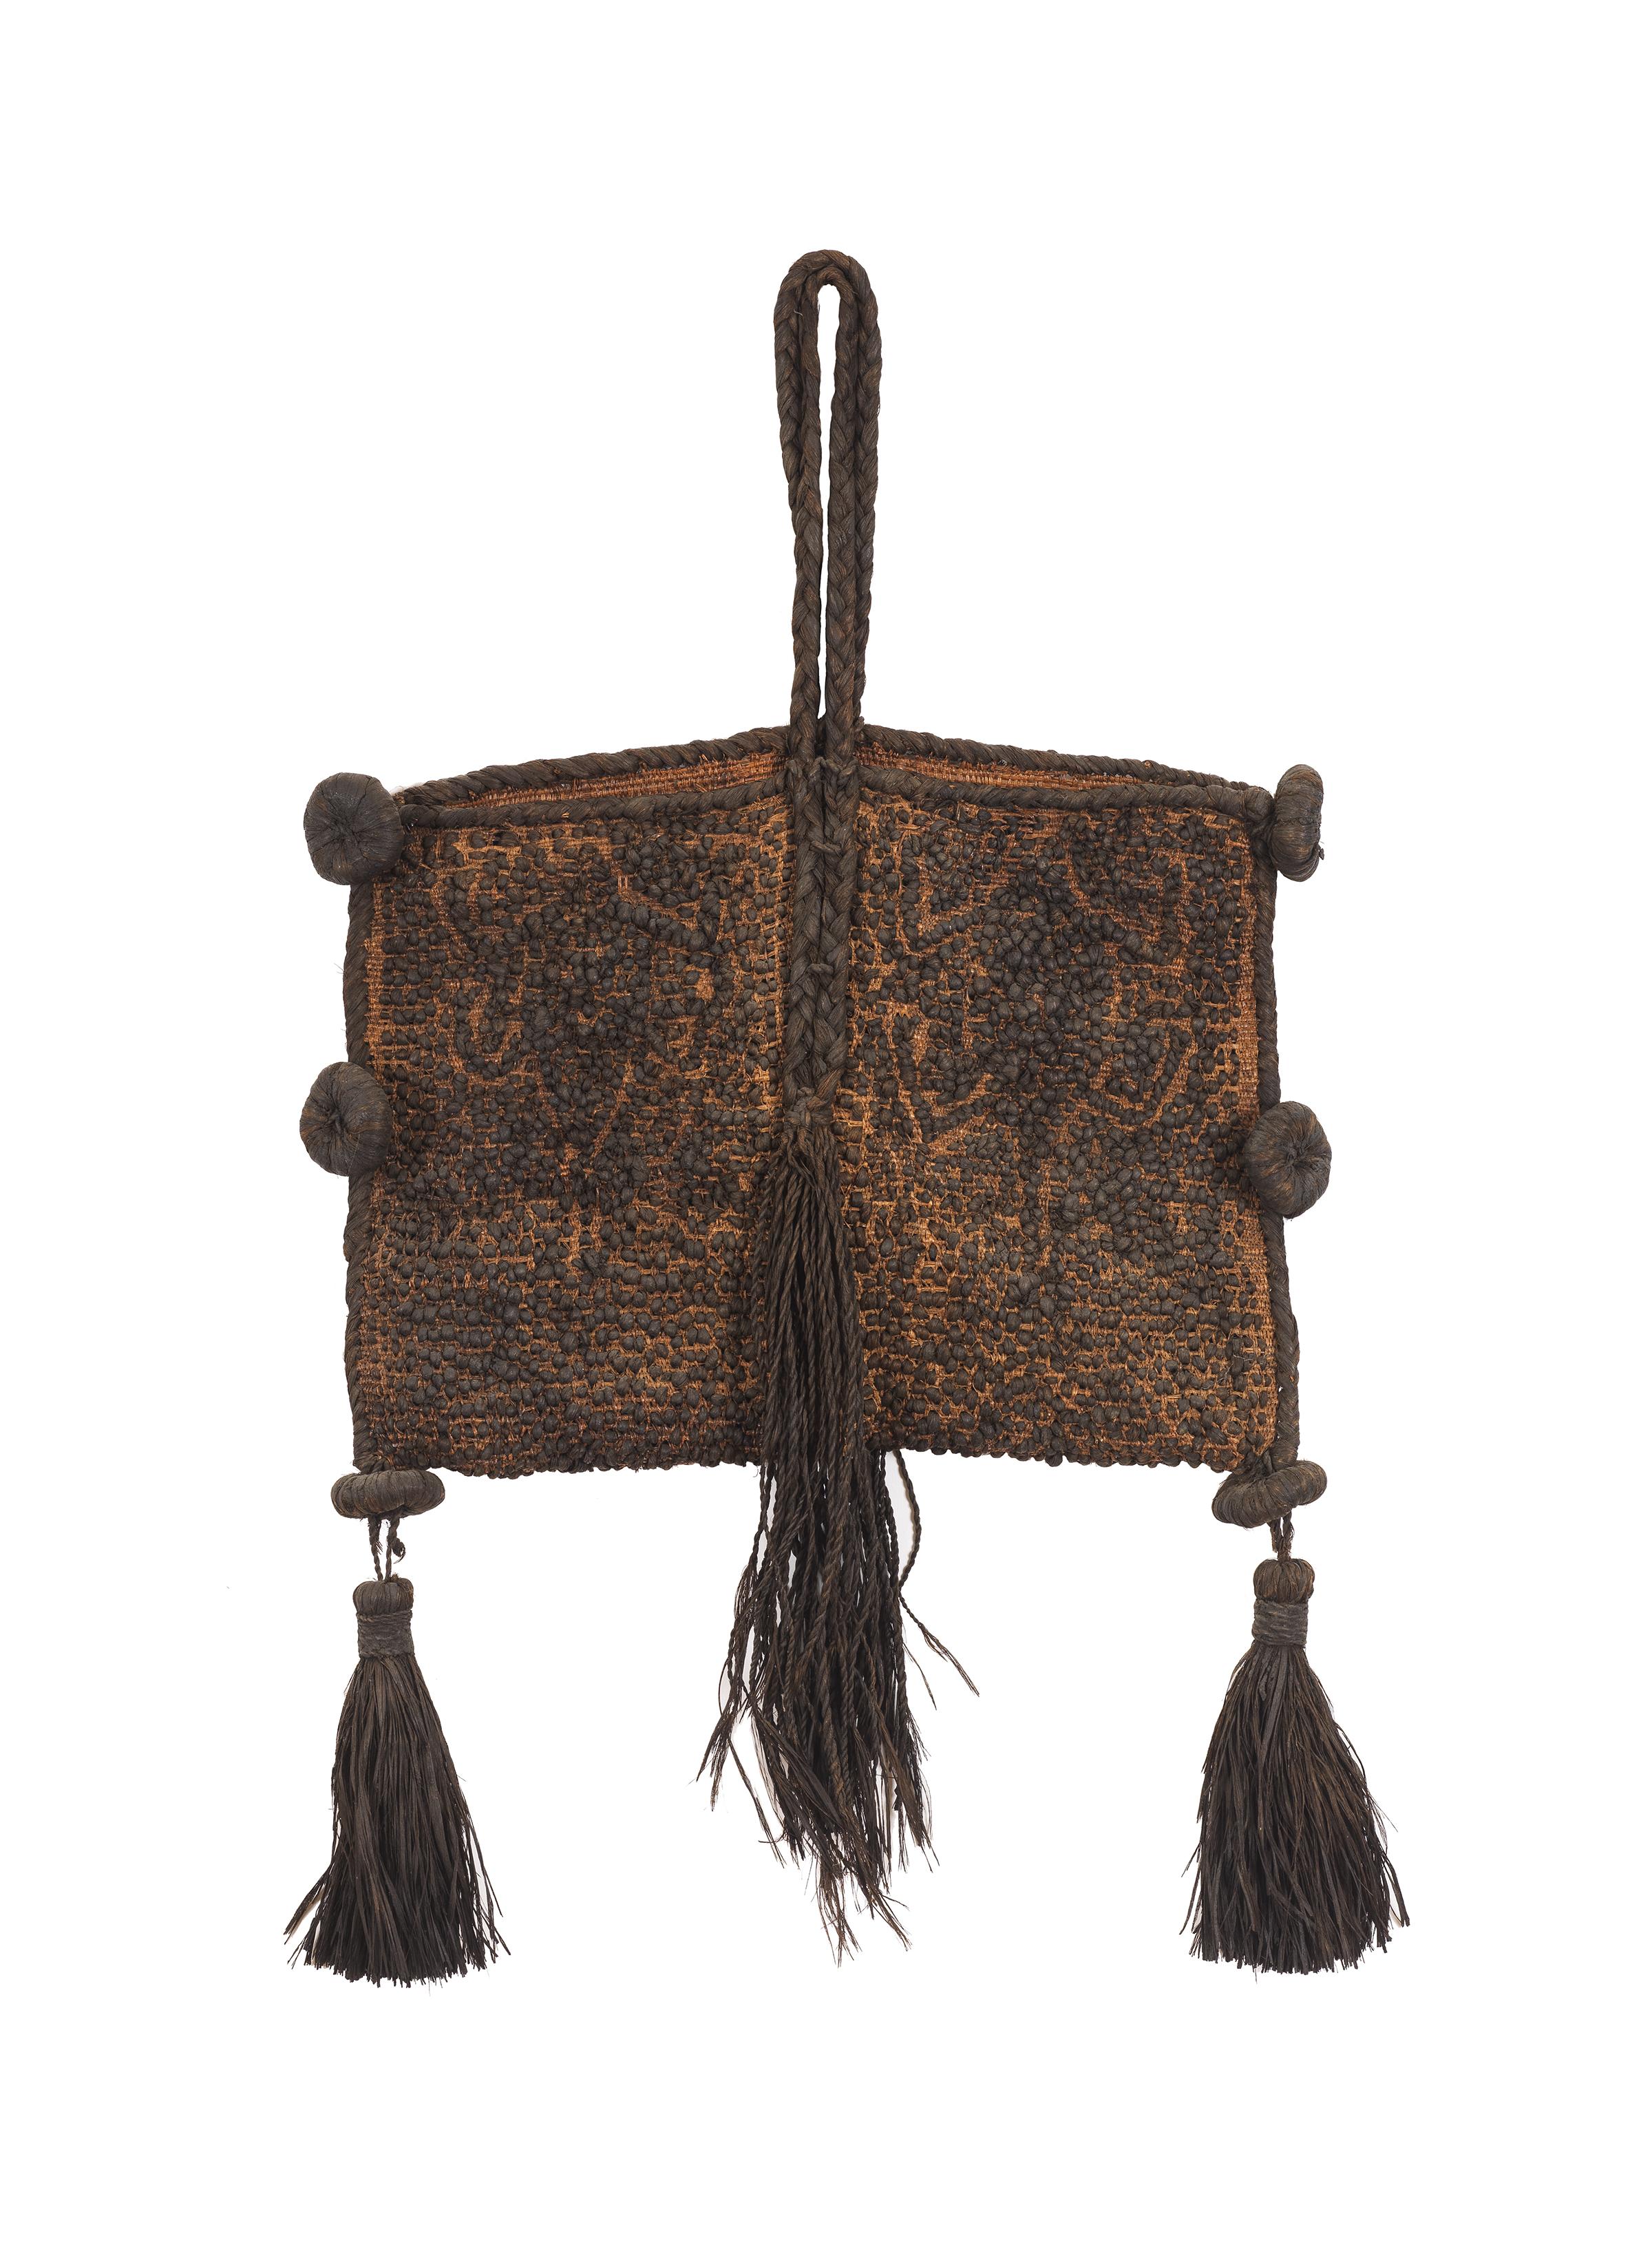 Bamoun Ceremonial Bag or Insignia